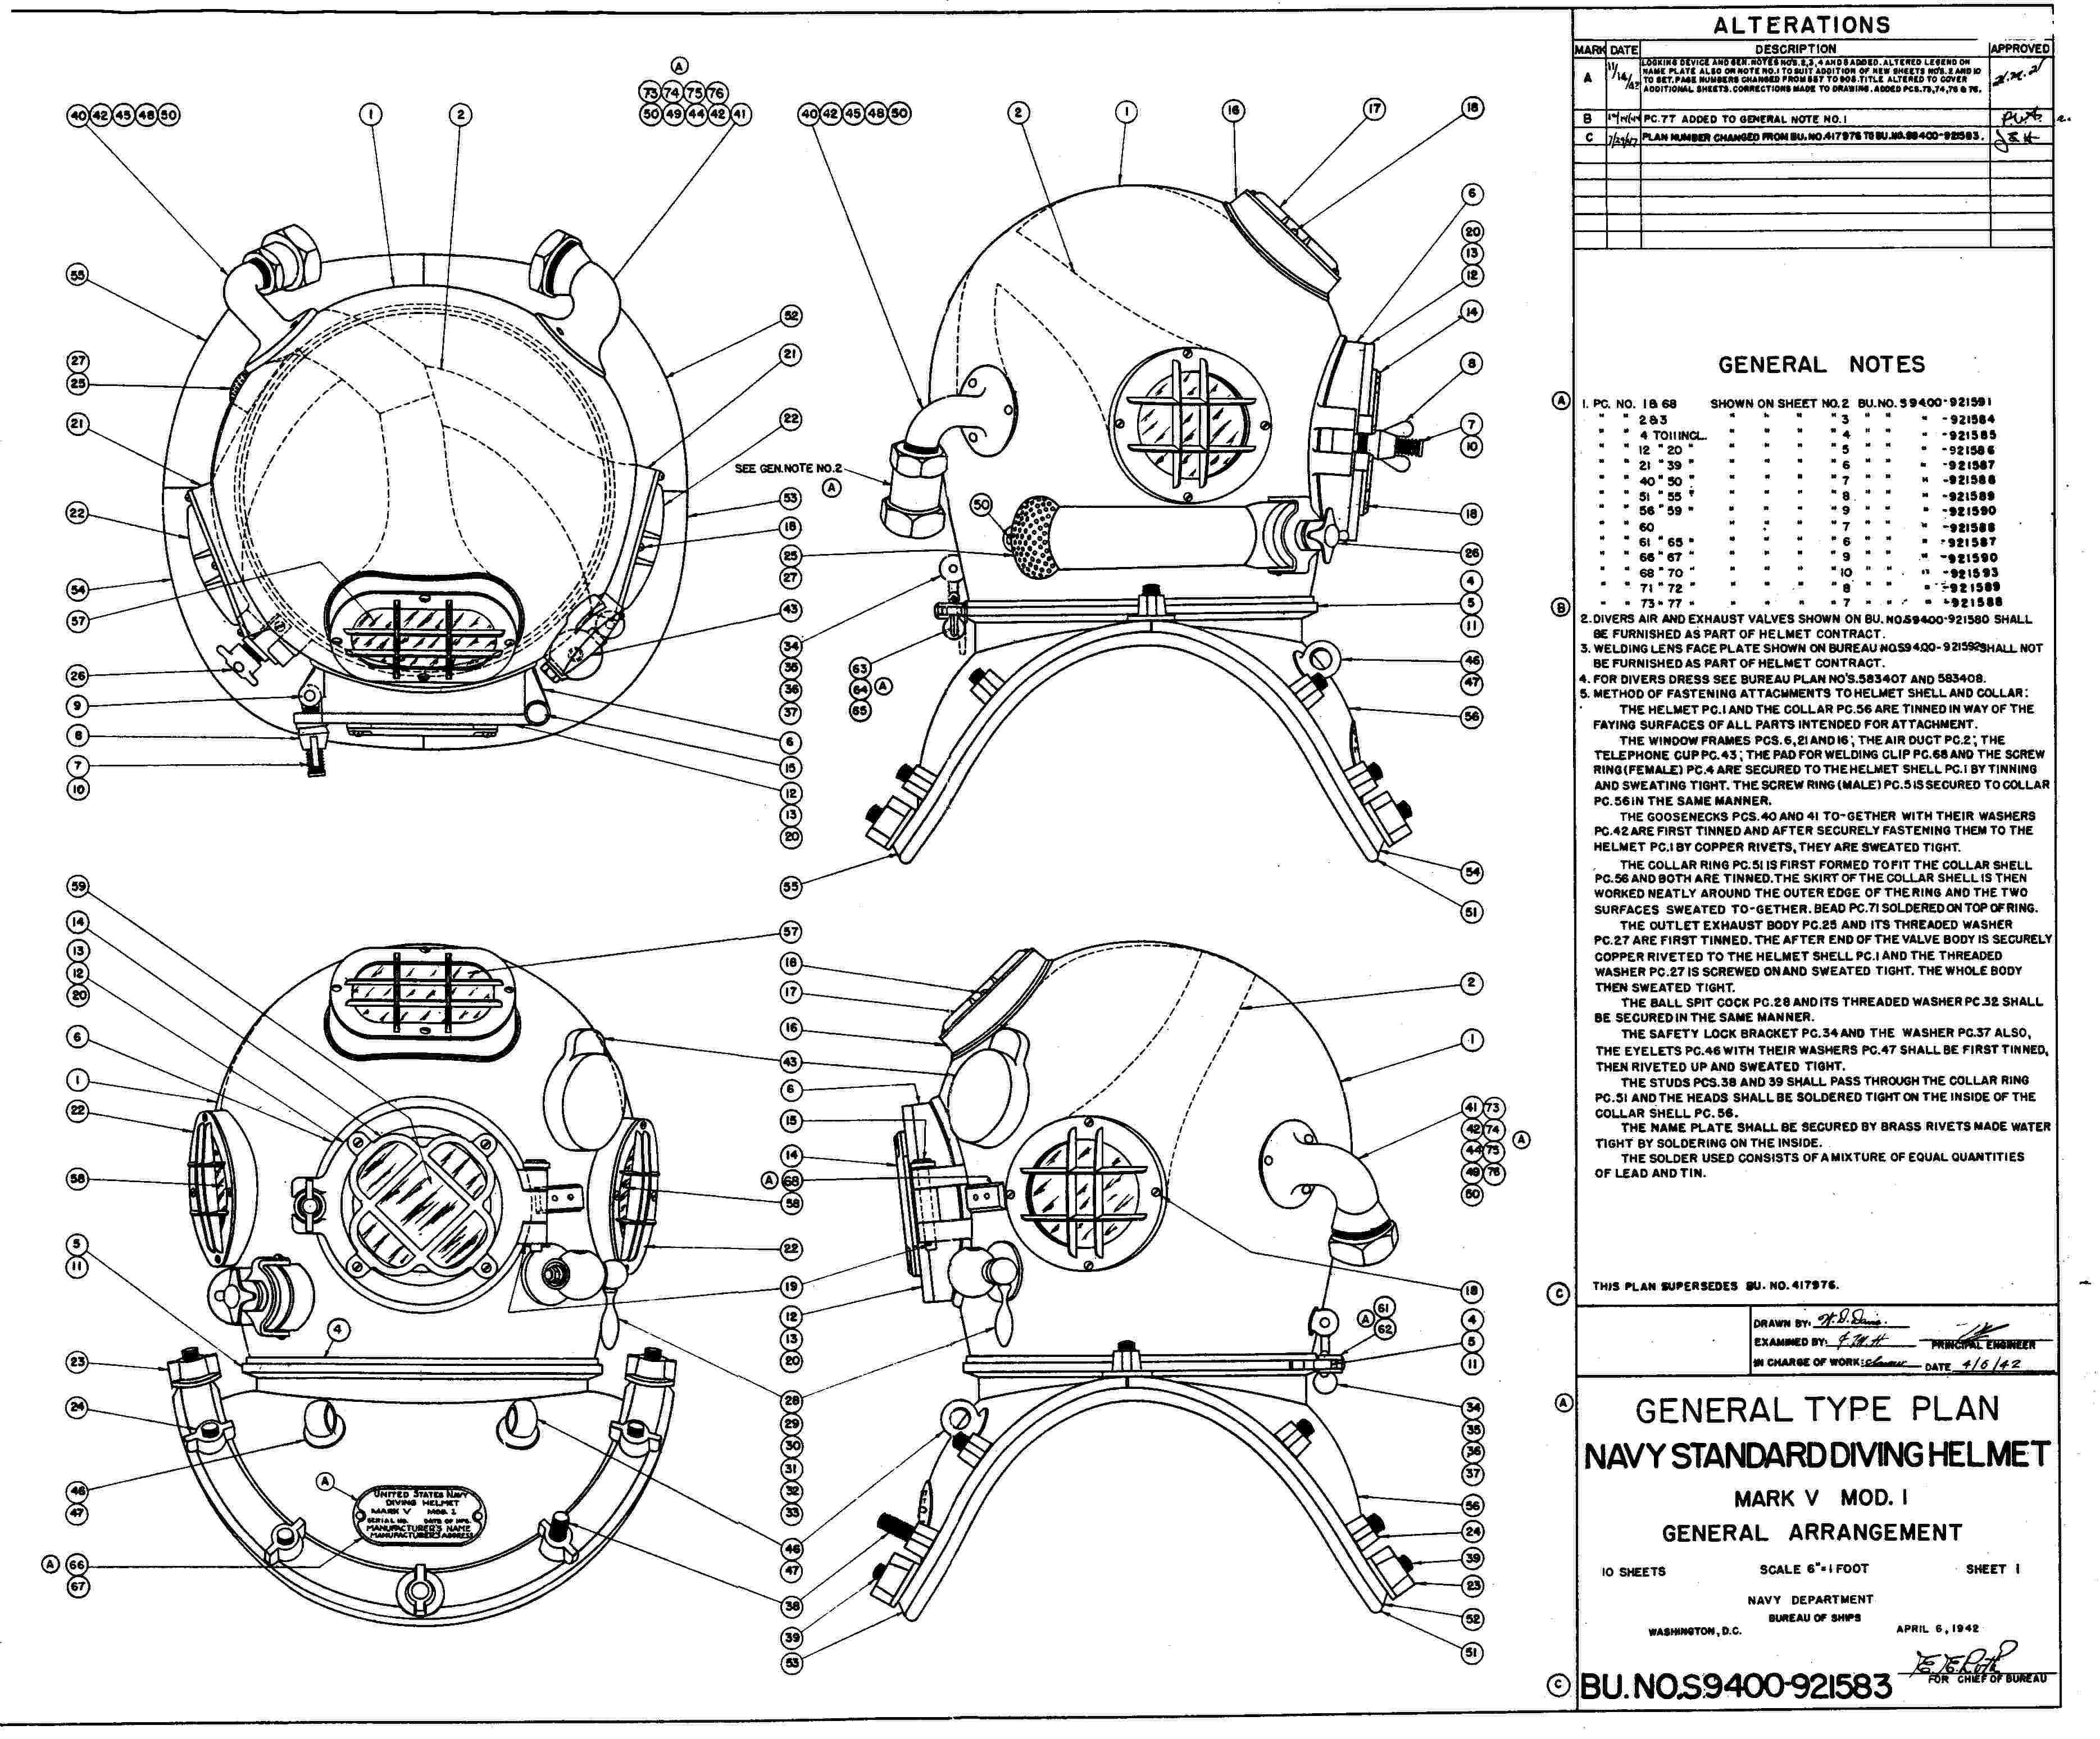 Navy MK V drawing